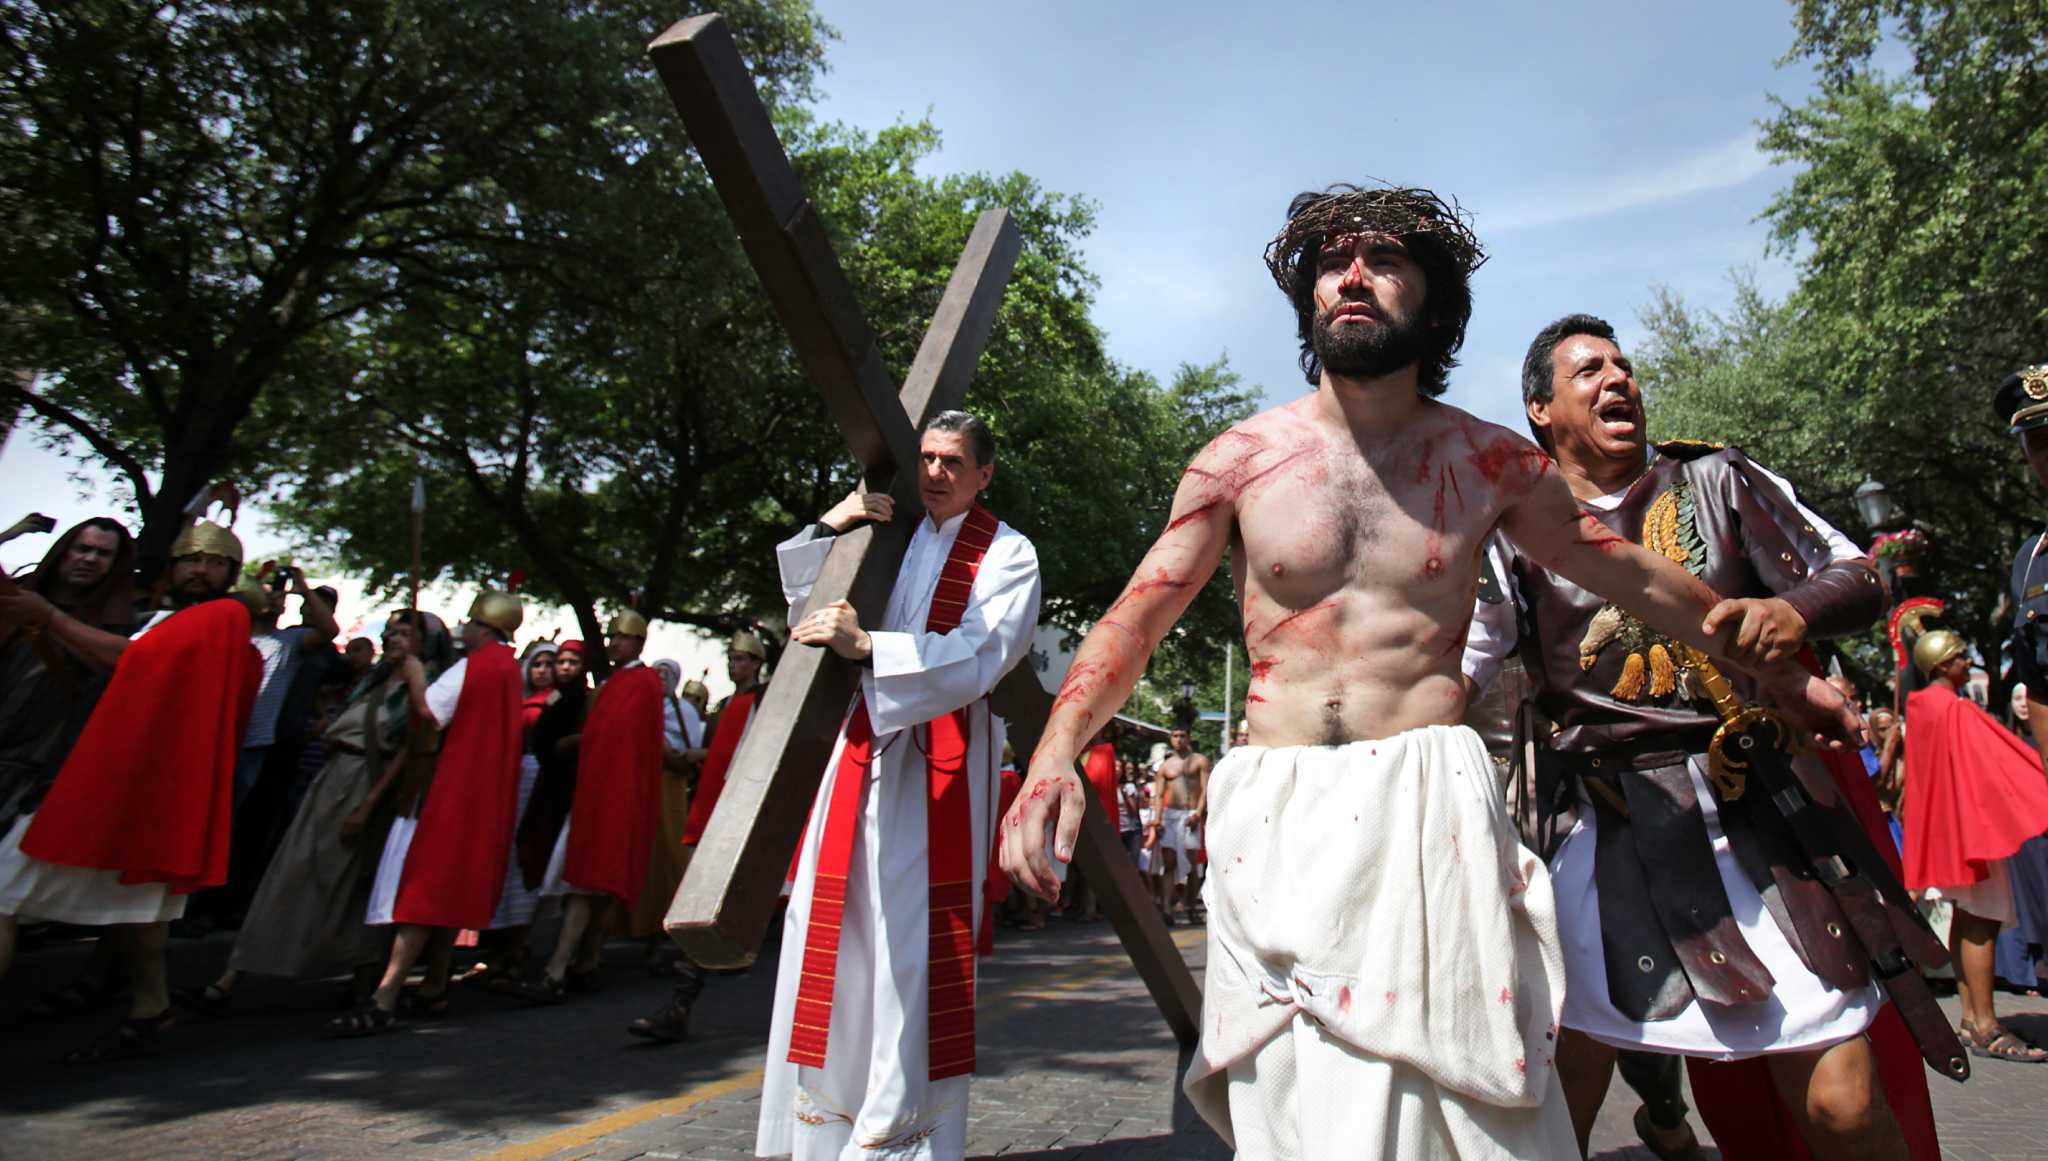 Crucifixion Drama Draws Crowd San Antonio Express News